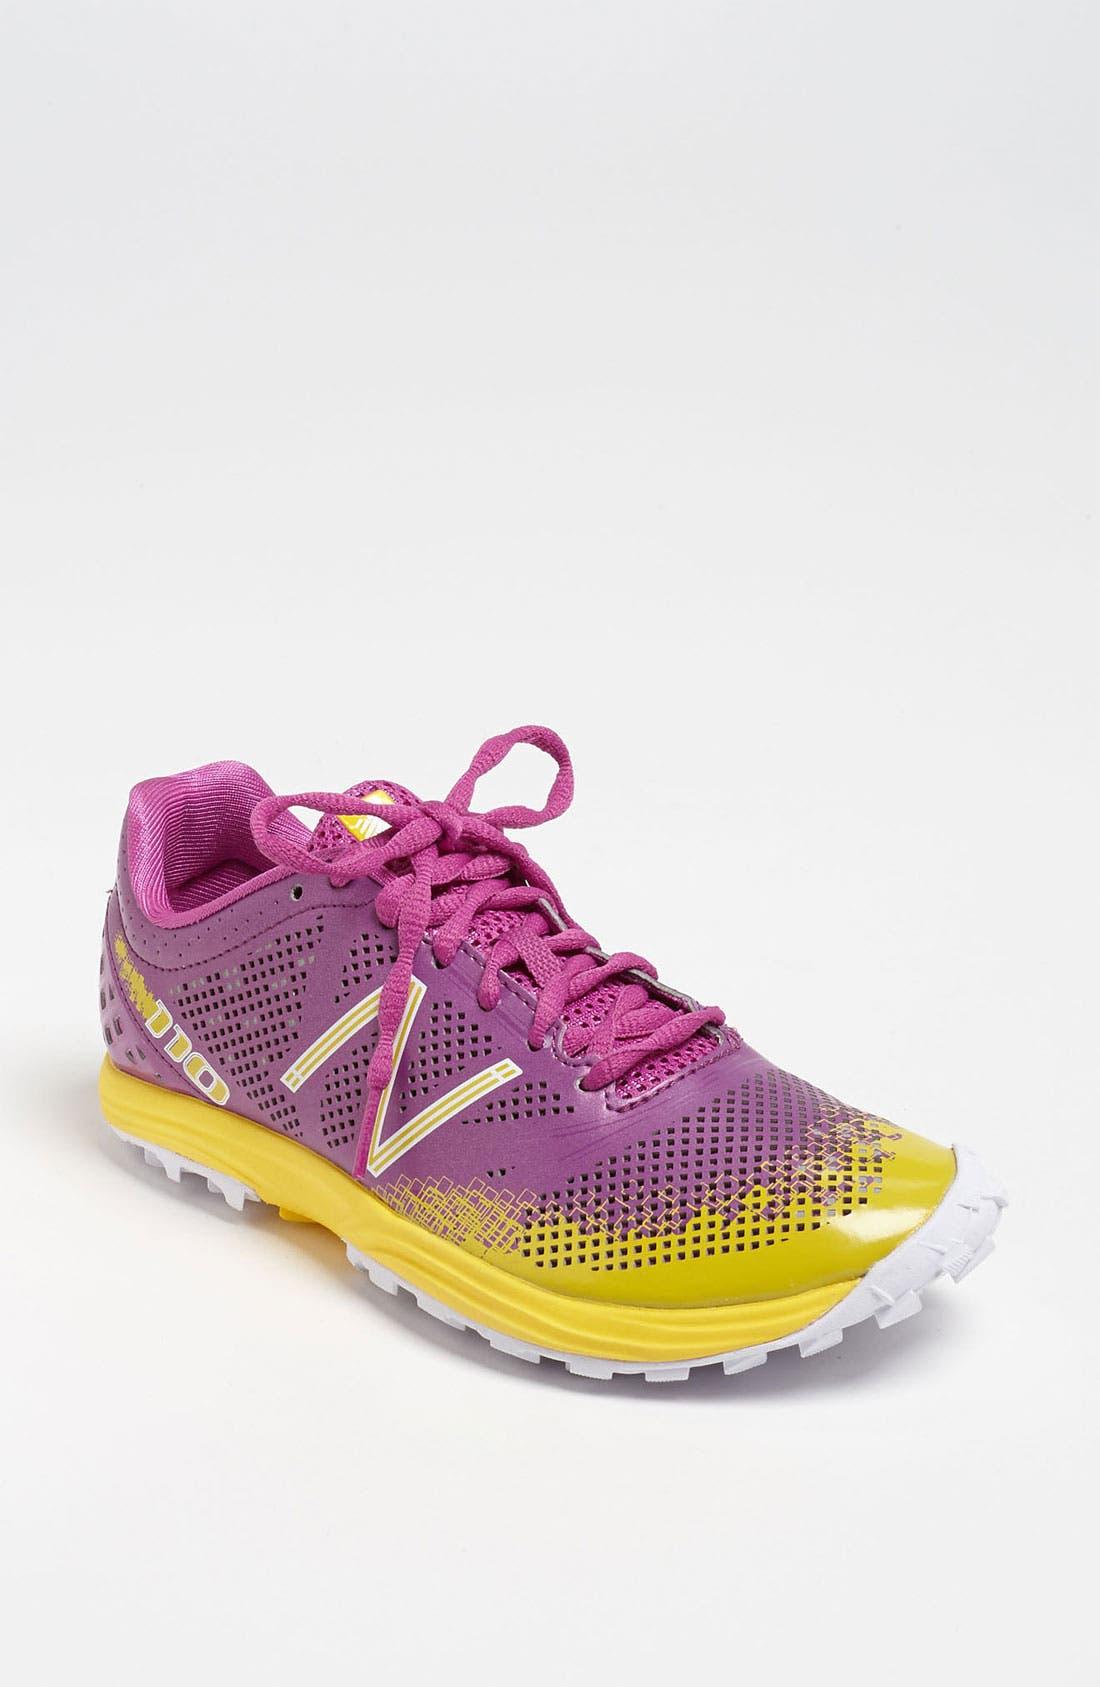 Alternate Image 1 Selected - New Balance '110 V1' Trail Running Shoe (Women)(Retail Price: $89.95)